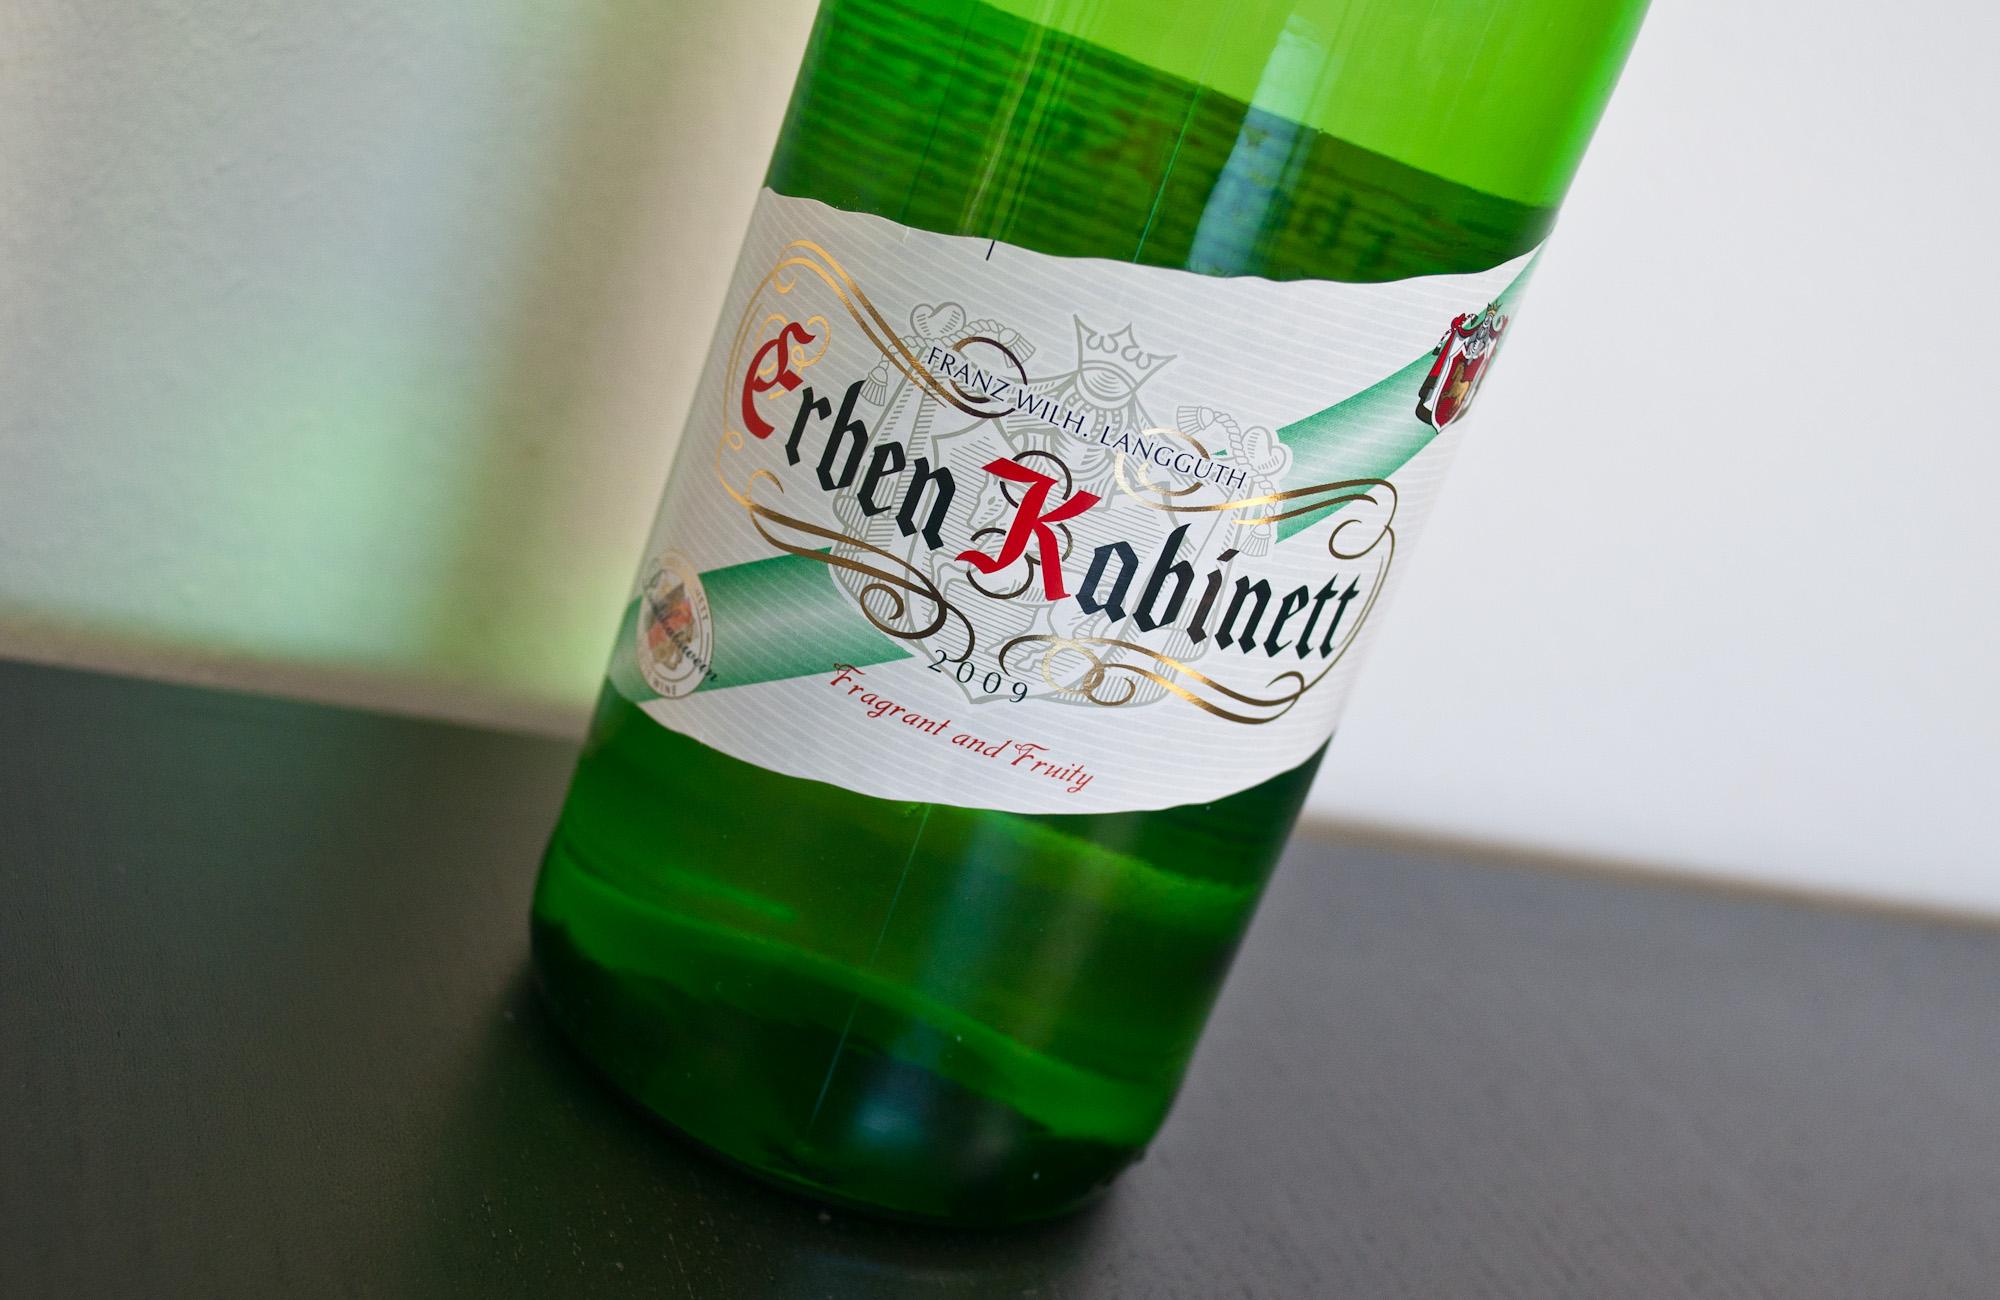 F. W. Langguth Erben Kabinett, 12   The Wine Rambler